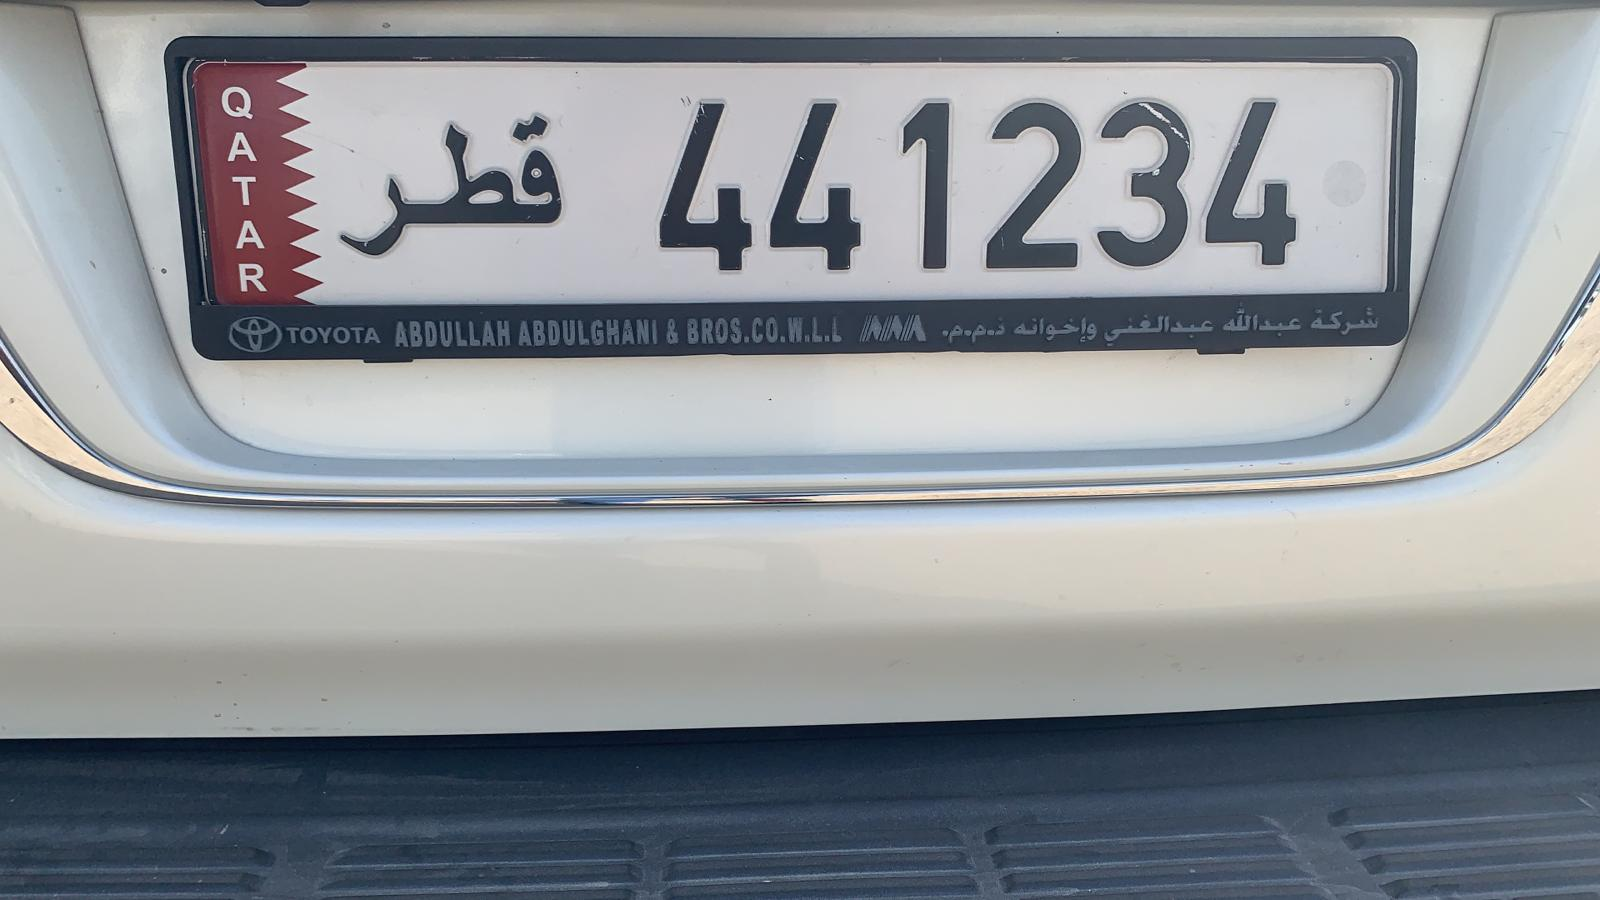 441234